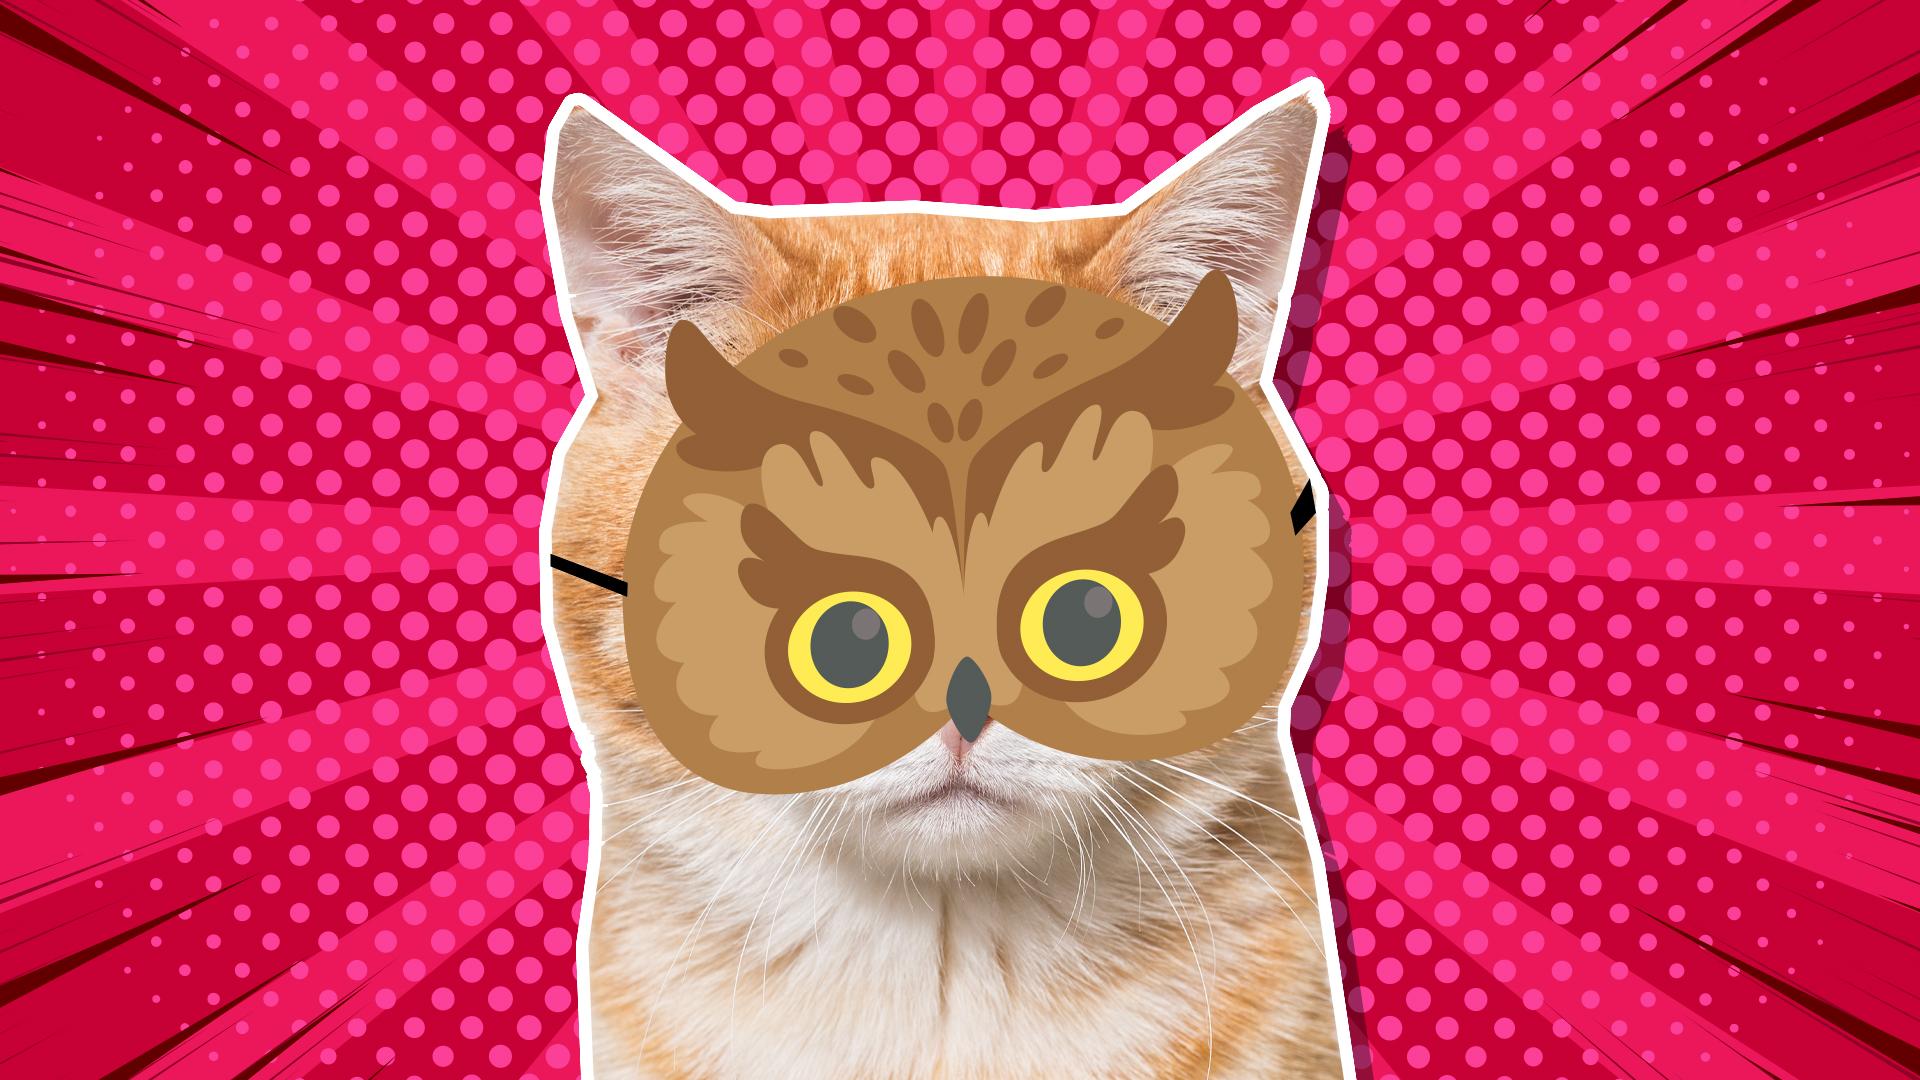 Cat in owl mask